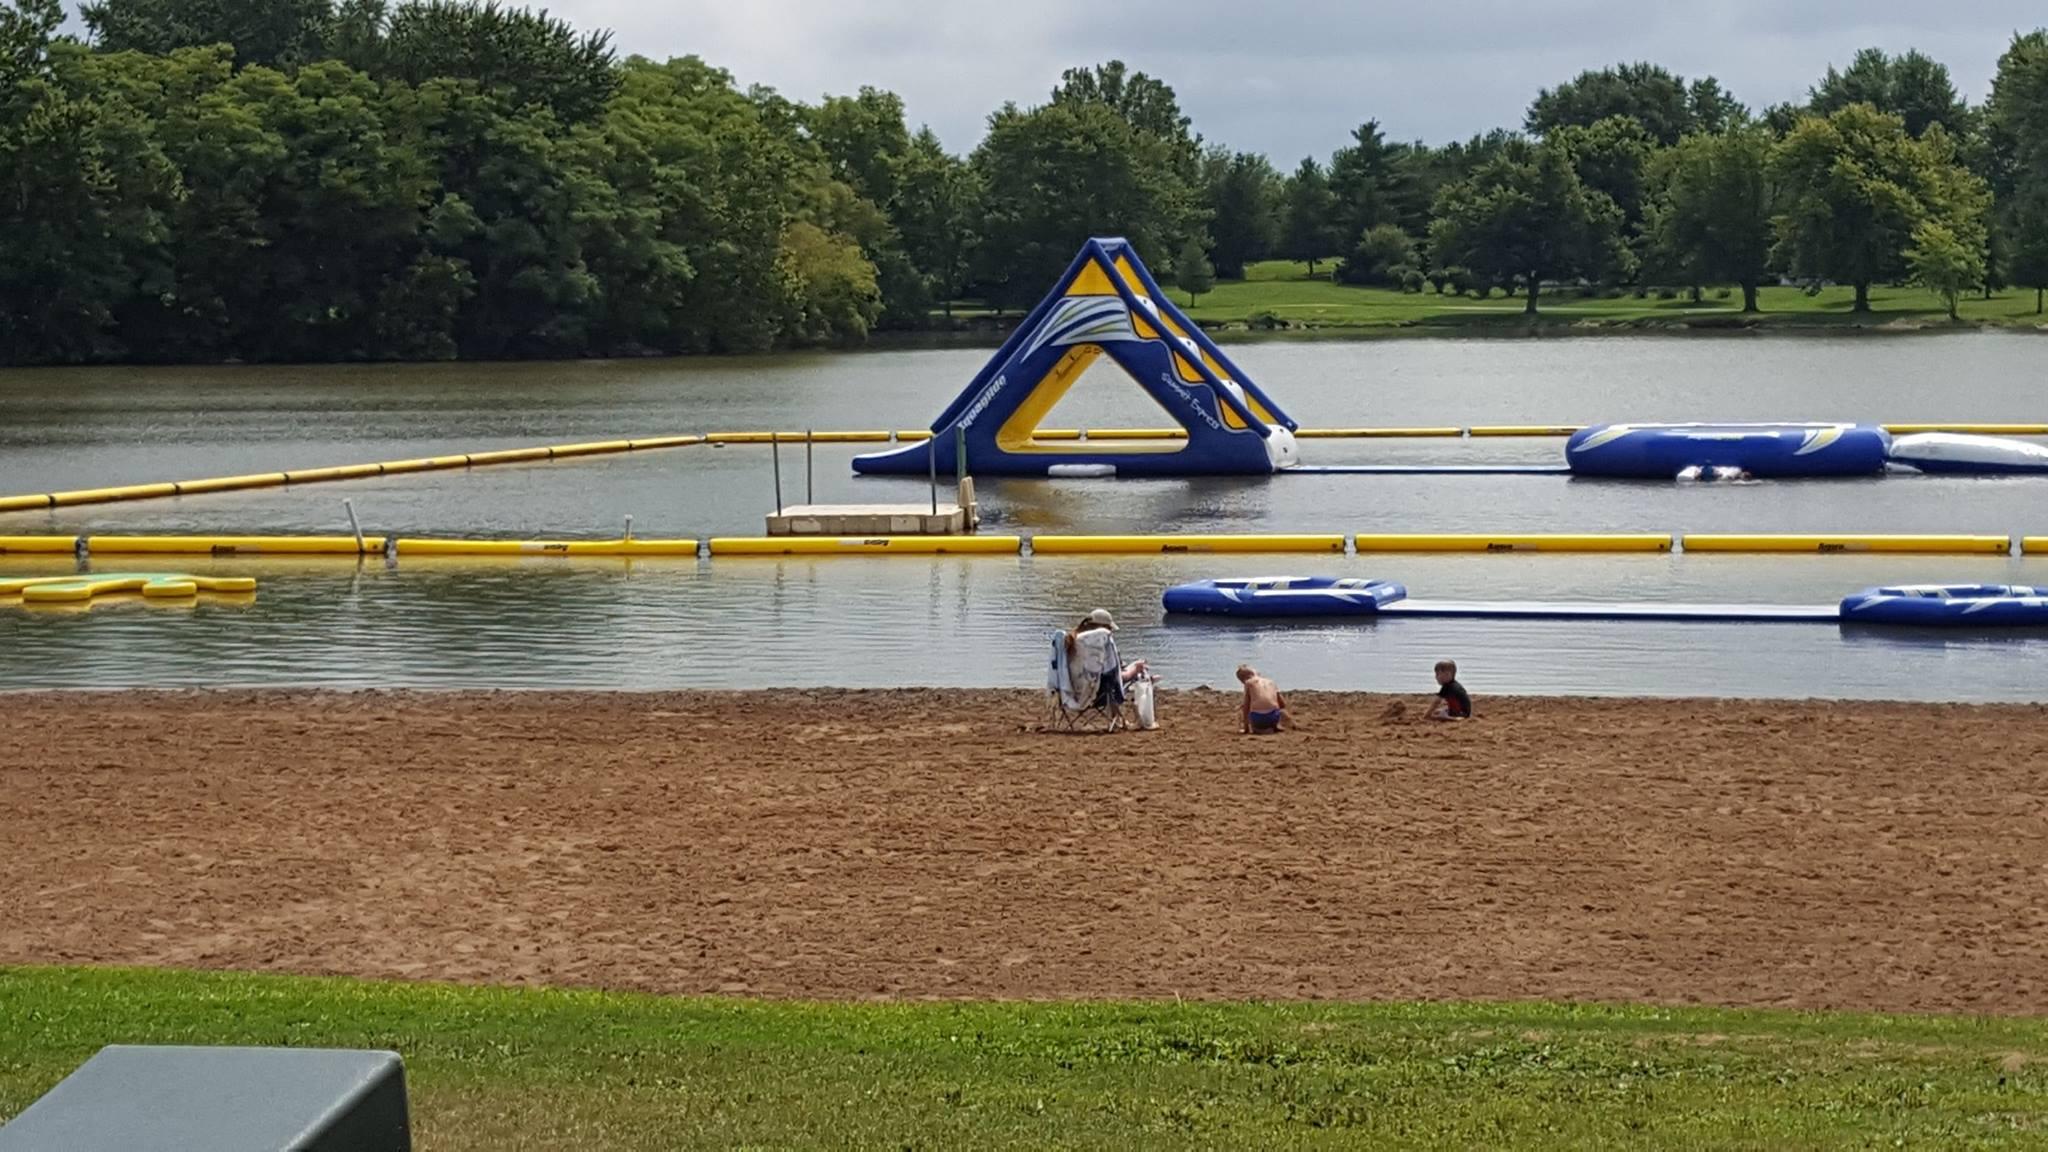 Jellystone Park in Pittsfield, Illinois